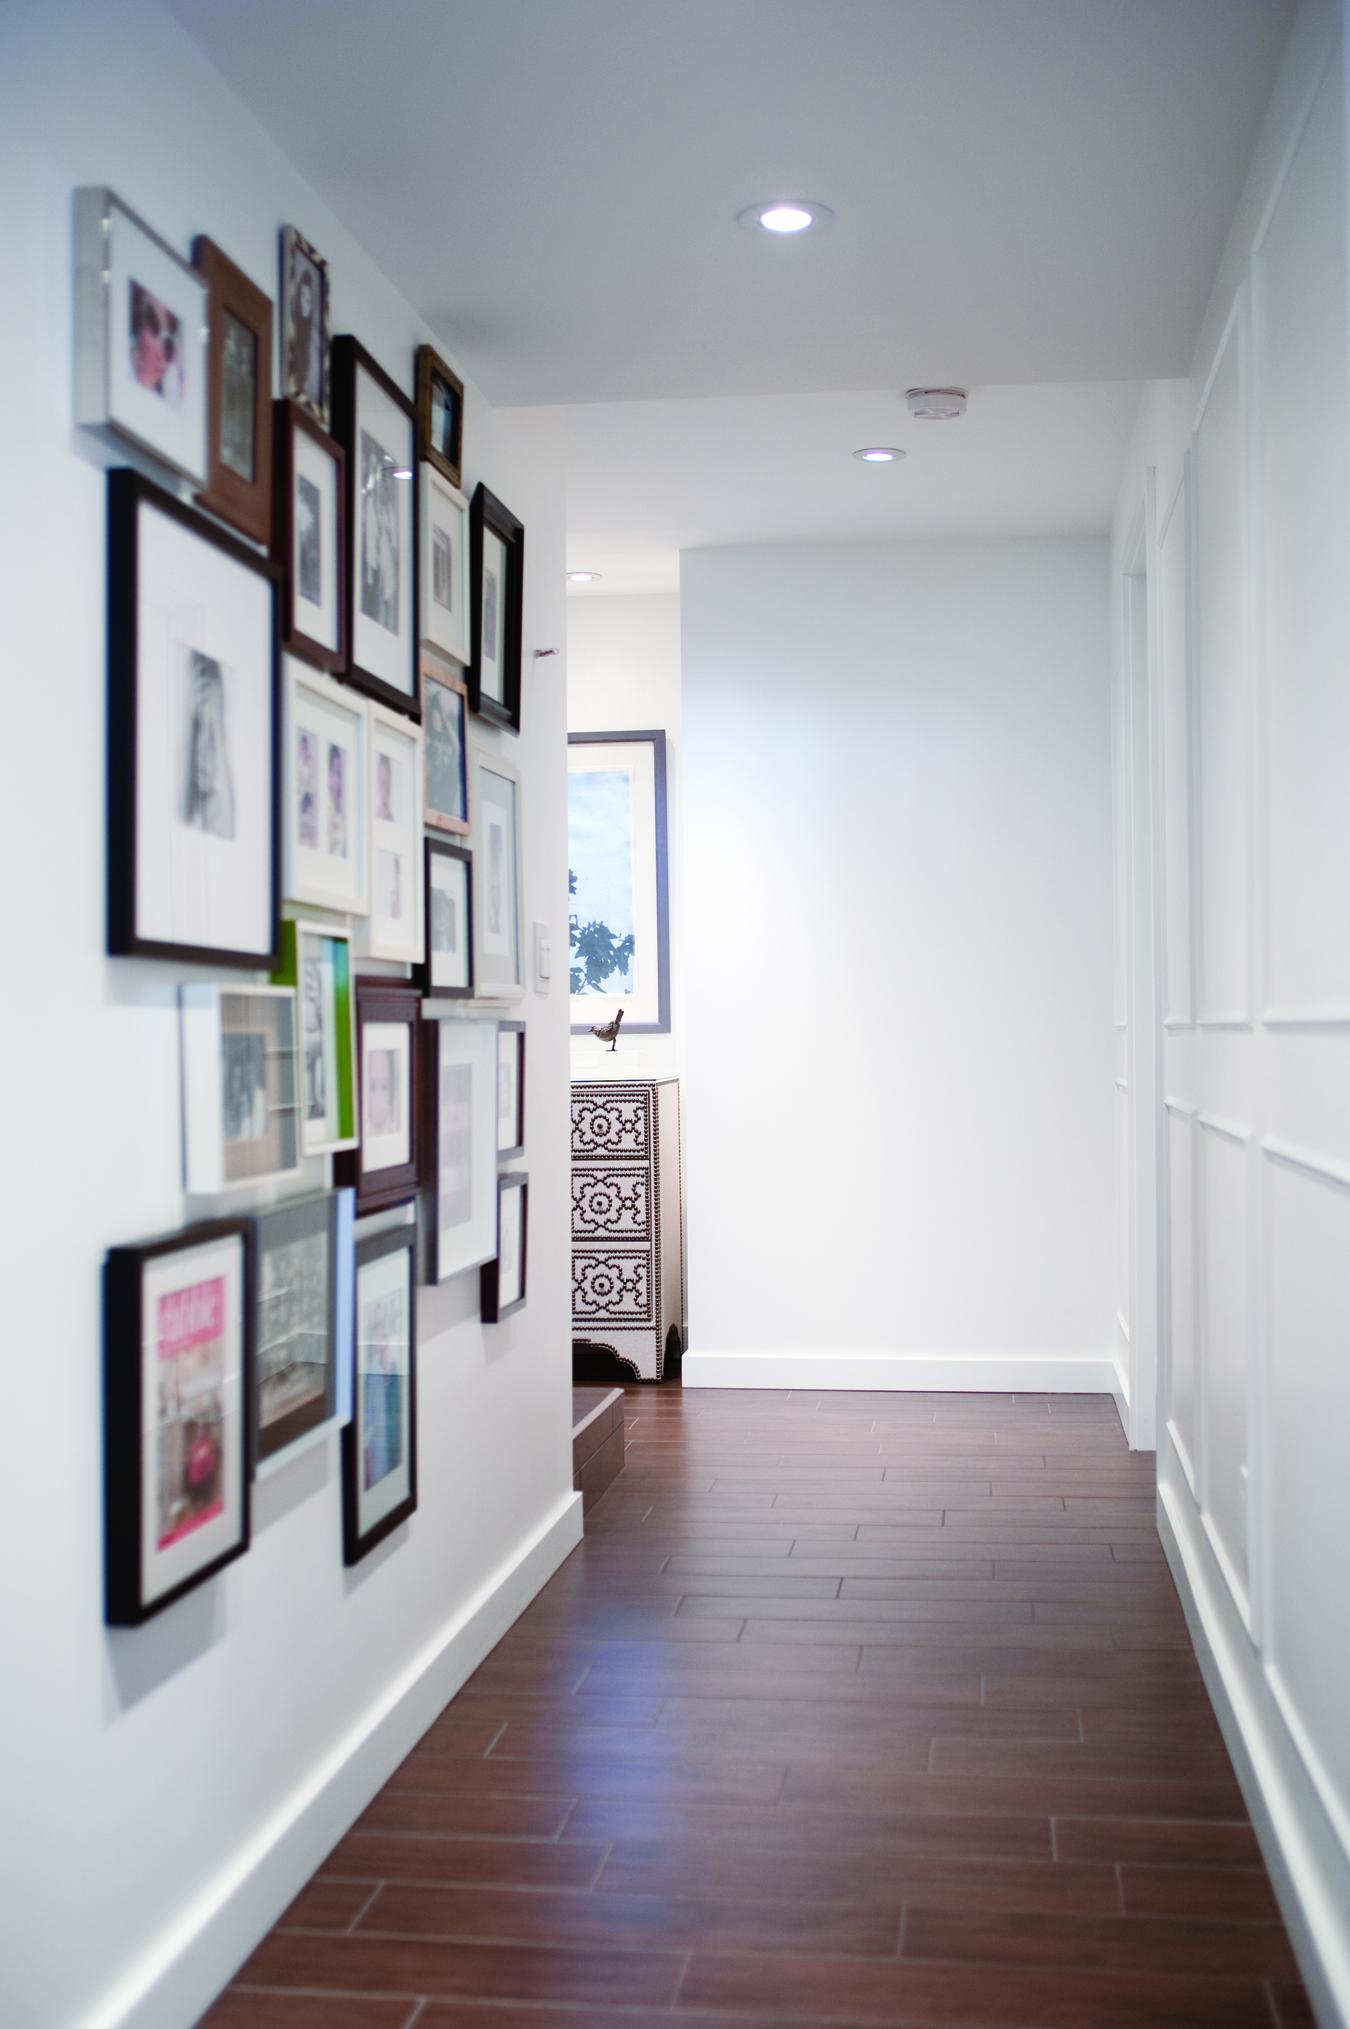 Hallway Gallery Wall, Nyla Free Designs, Calgary Interior Designer, Photo: Jared Sych